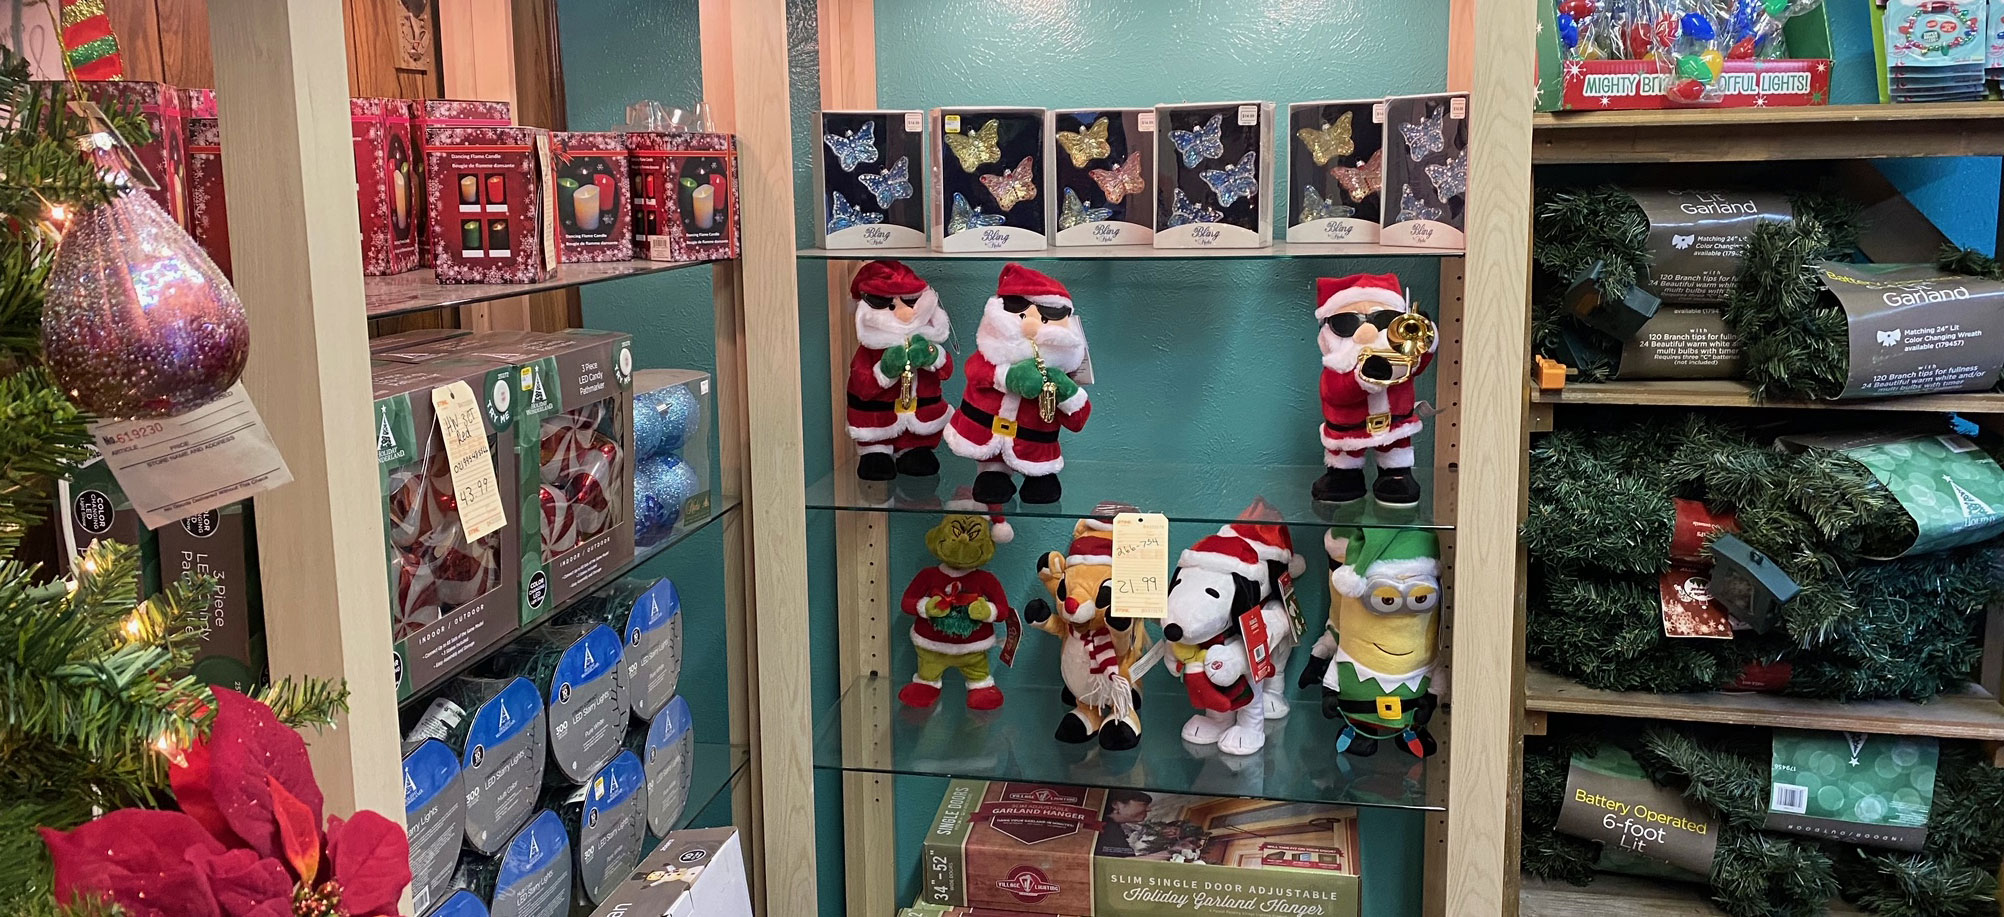 Beautiful Christmas decor and ornaments at Wallace Lumber Company